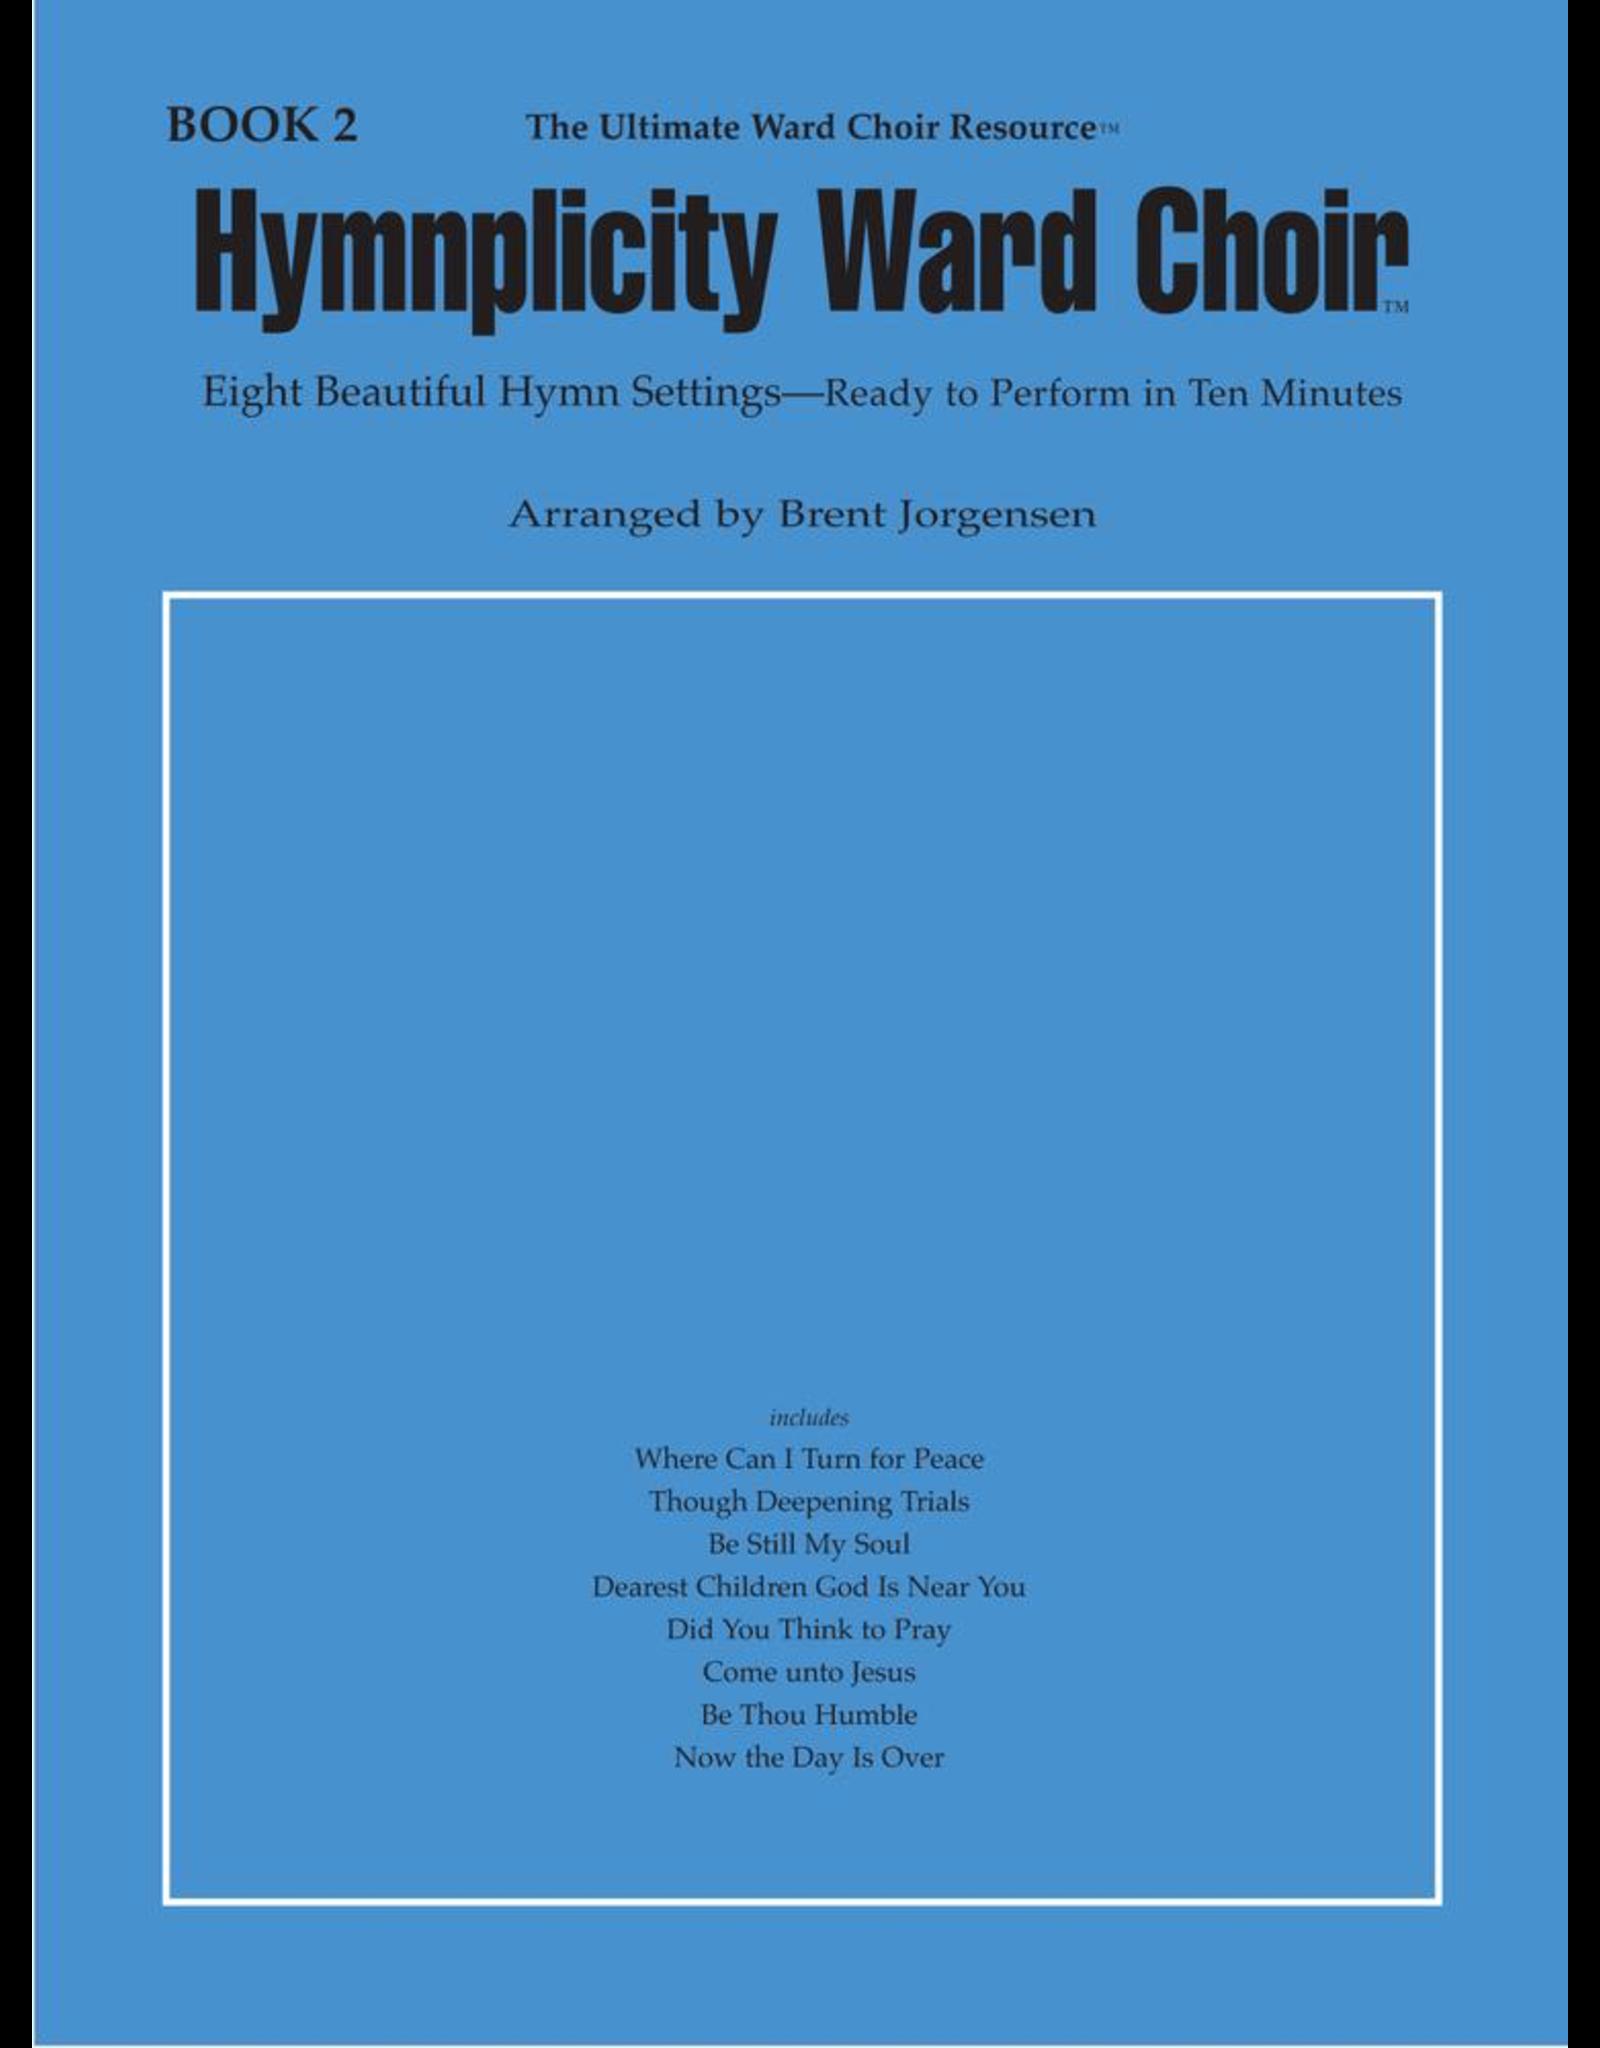 Jackman Music Hymnplicity Ward Choir Book 2